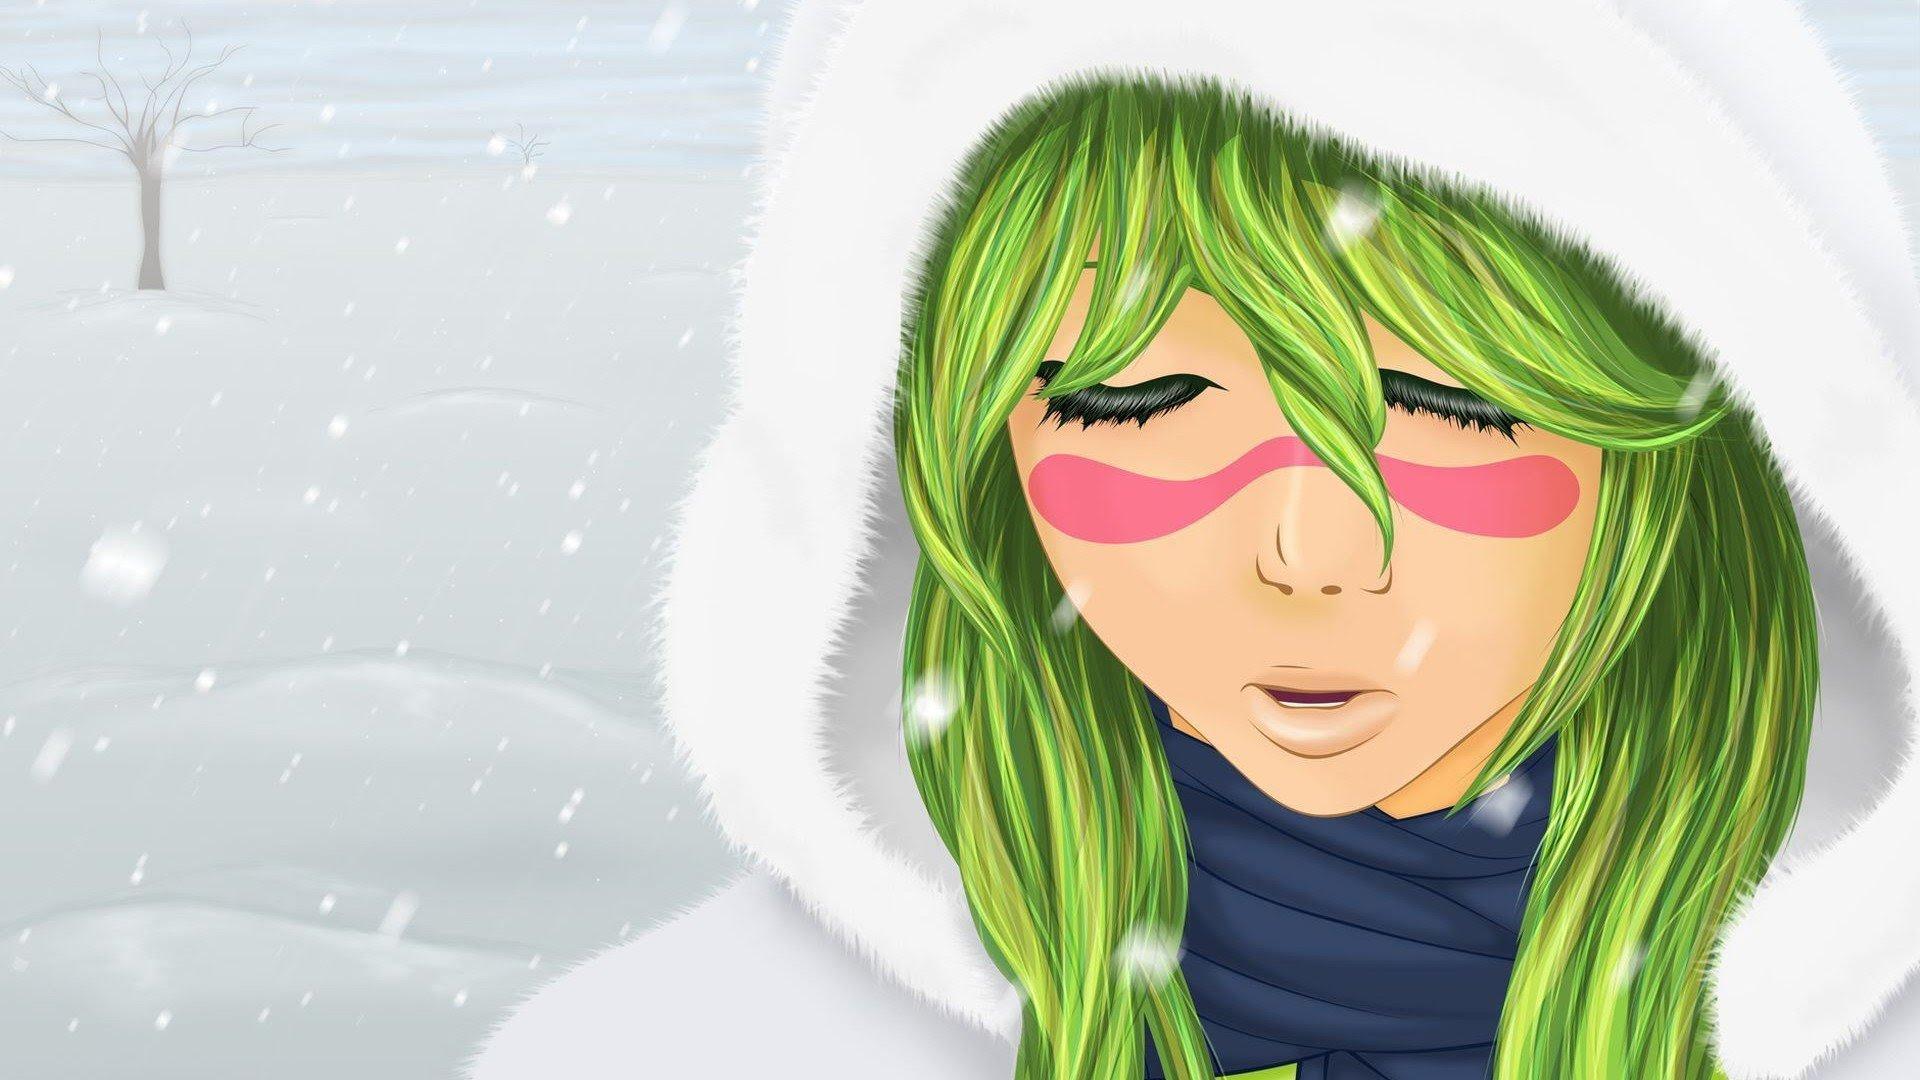 Anime series bleach girl green hair character wallpaper ...